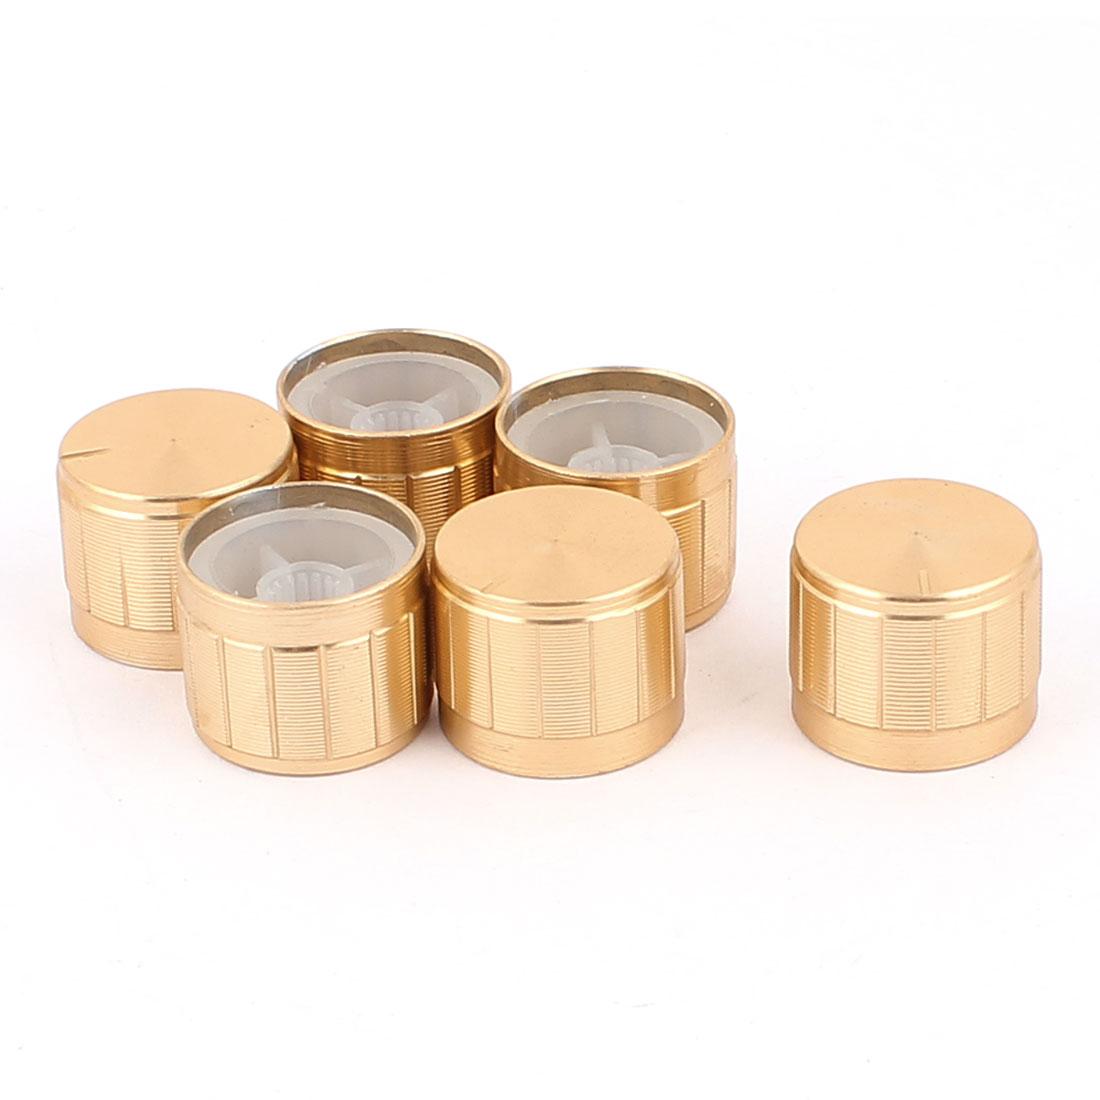 6 Pcs 21mm x 6mm Aluminium Alloy Potentiometer Control Knob Mini Cap Knurled Button Gold Tone